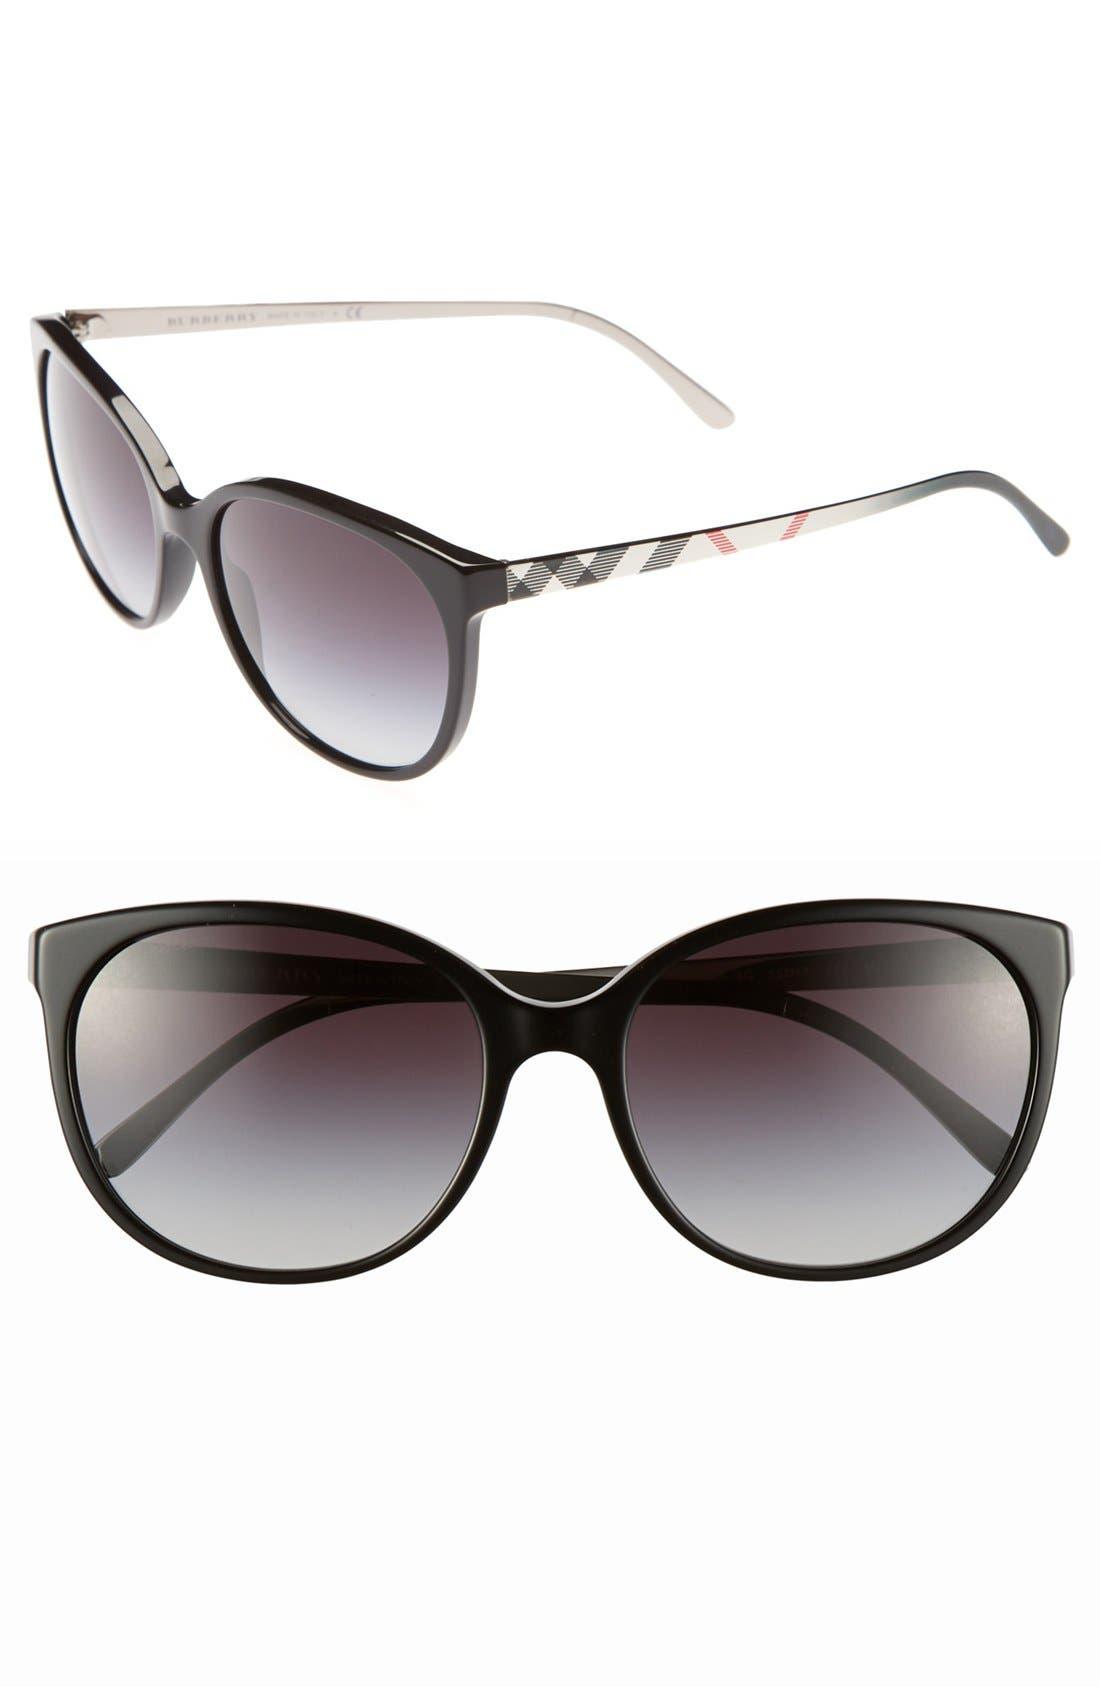 Alternate Image 1 Selected - Burberry 'Spark' 55mm Sunglasses